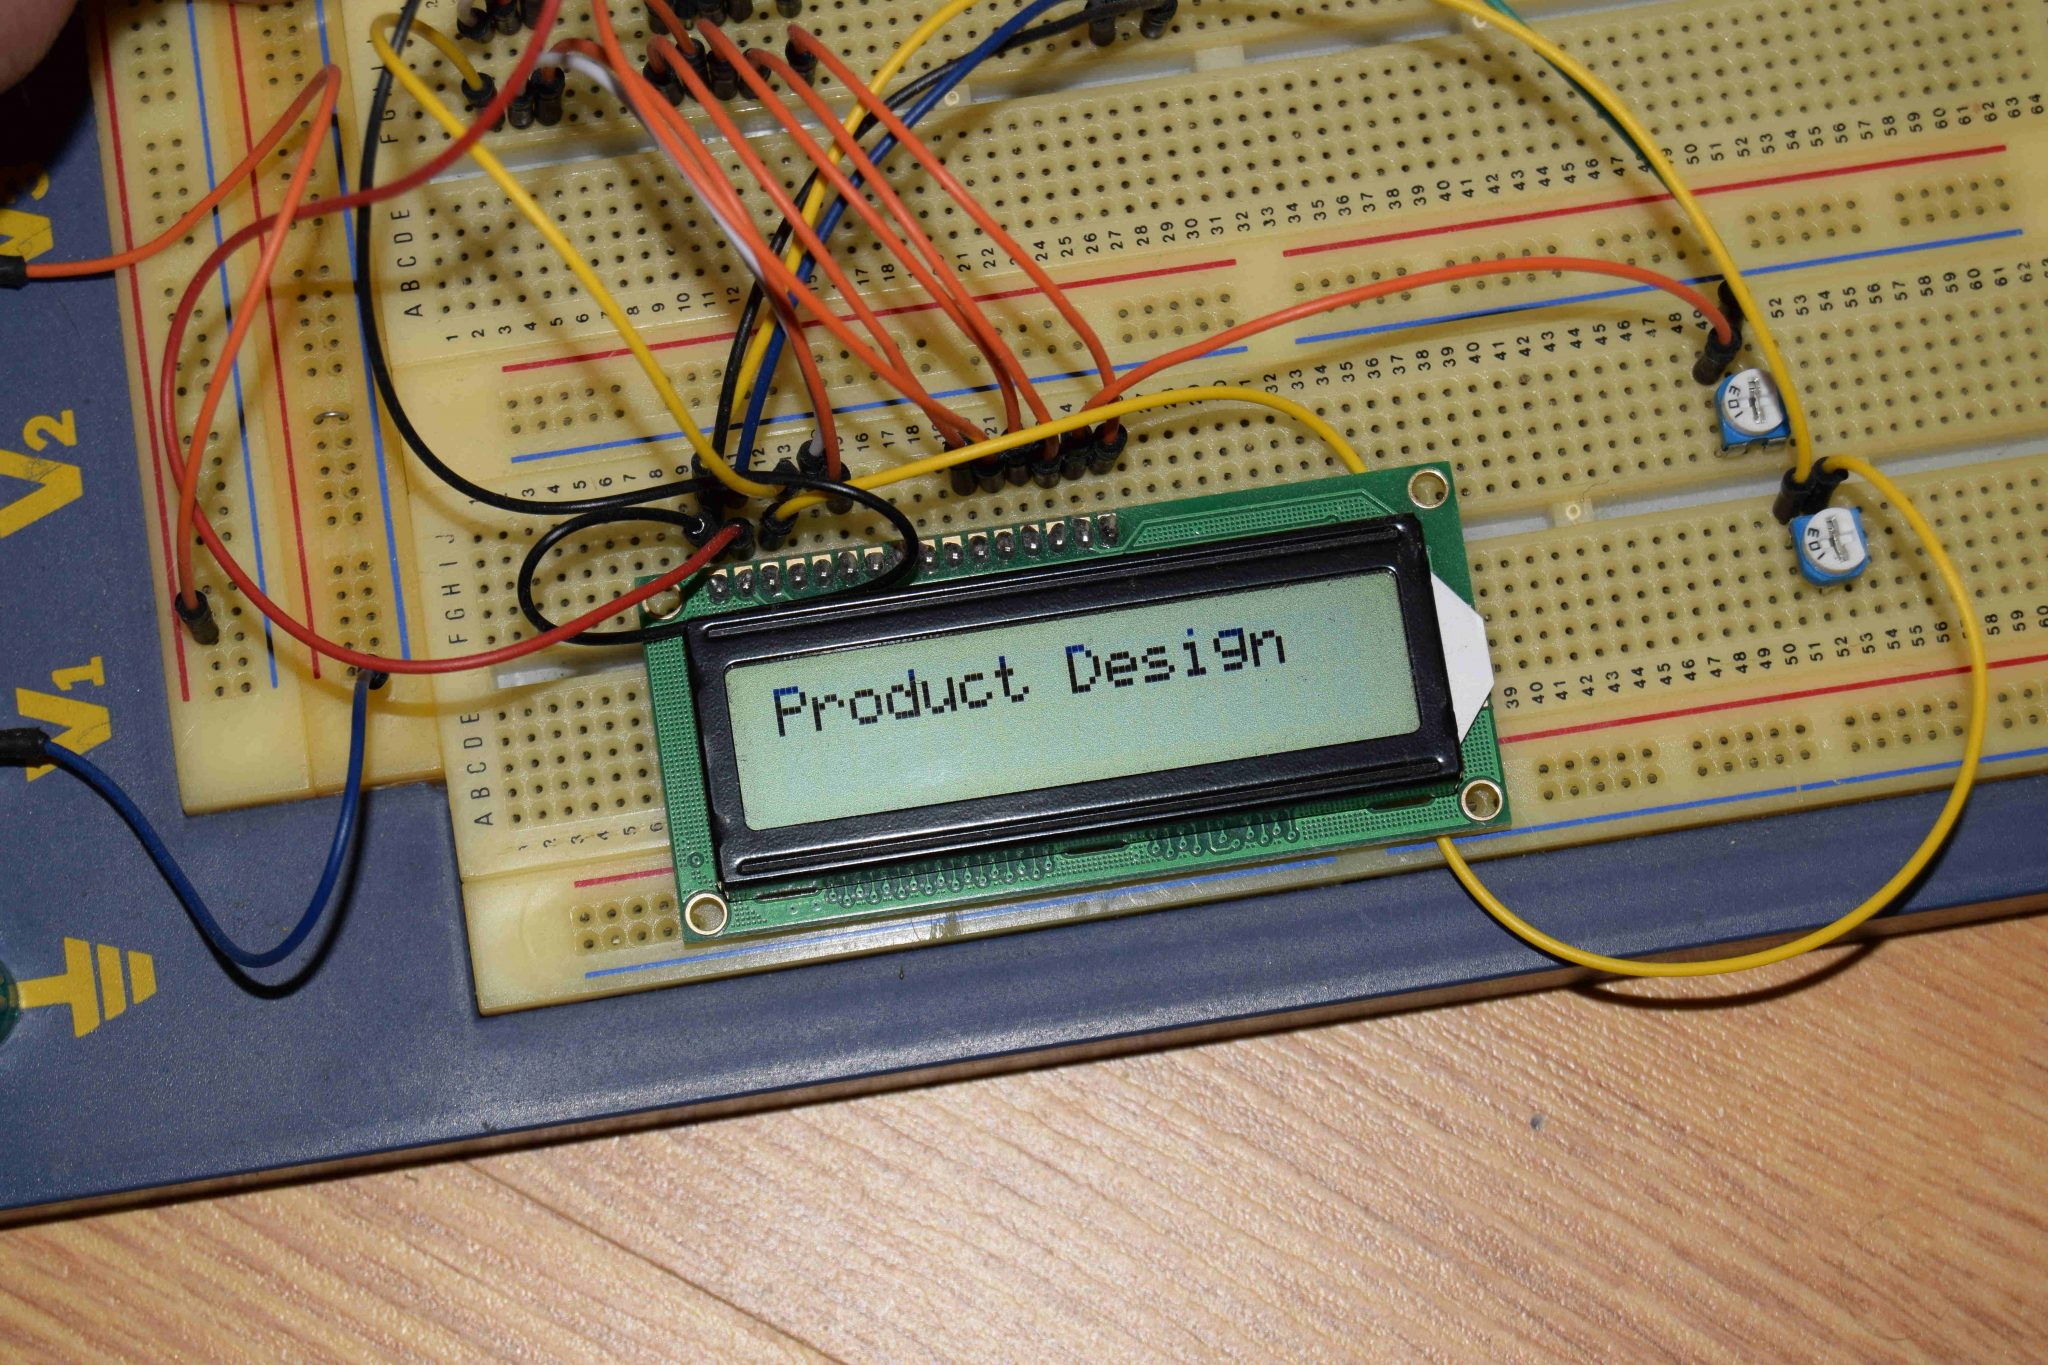 sensor product design